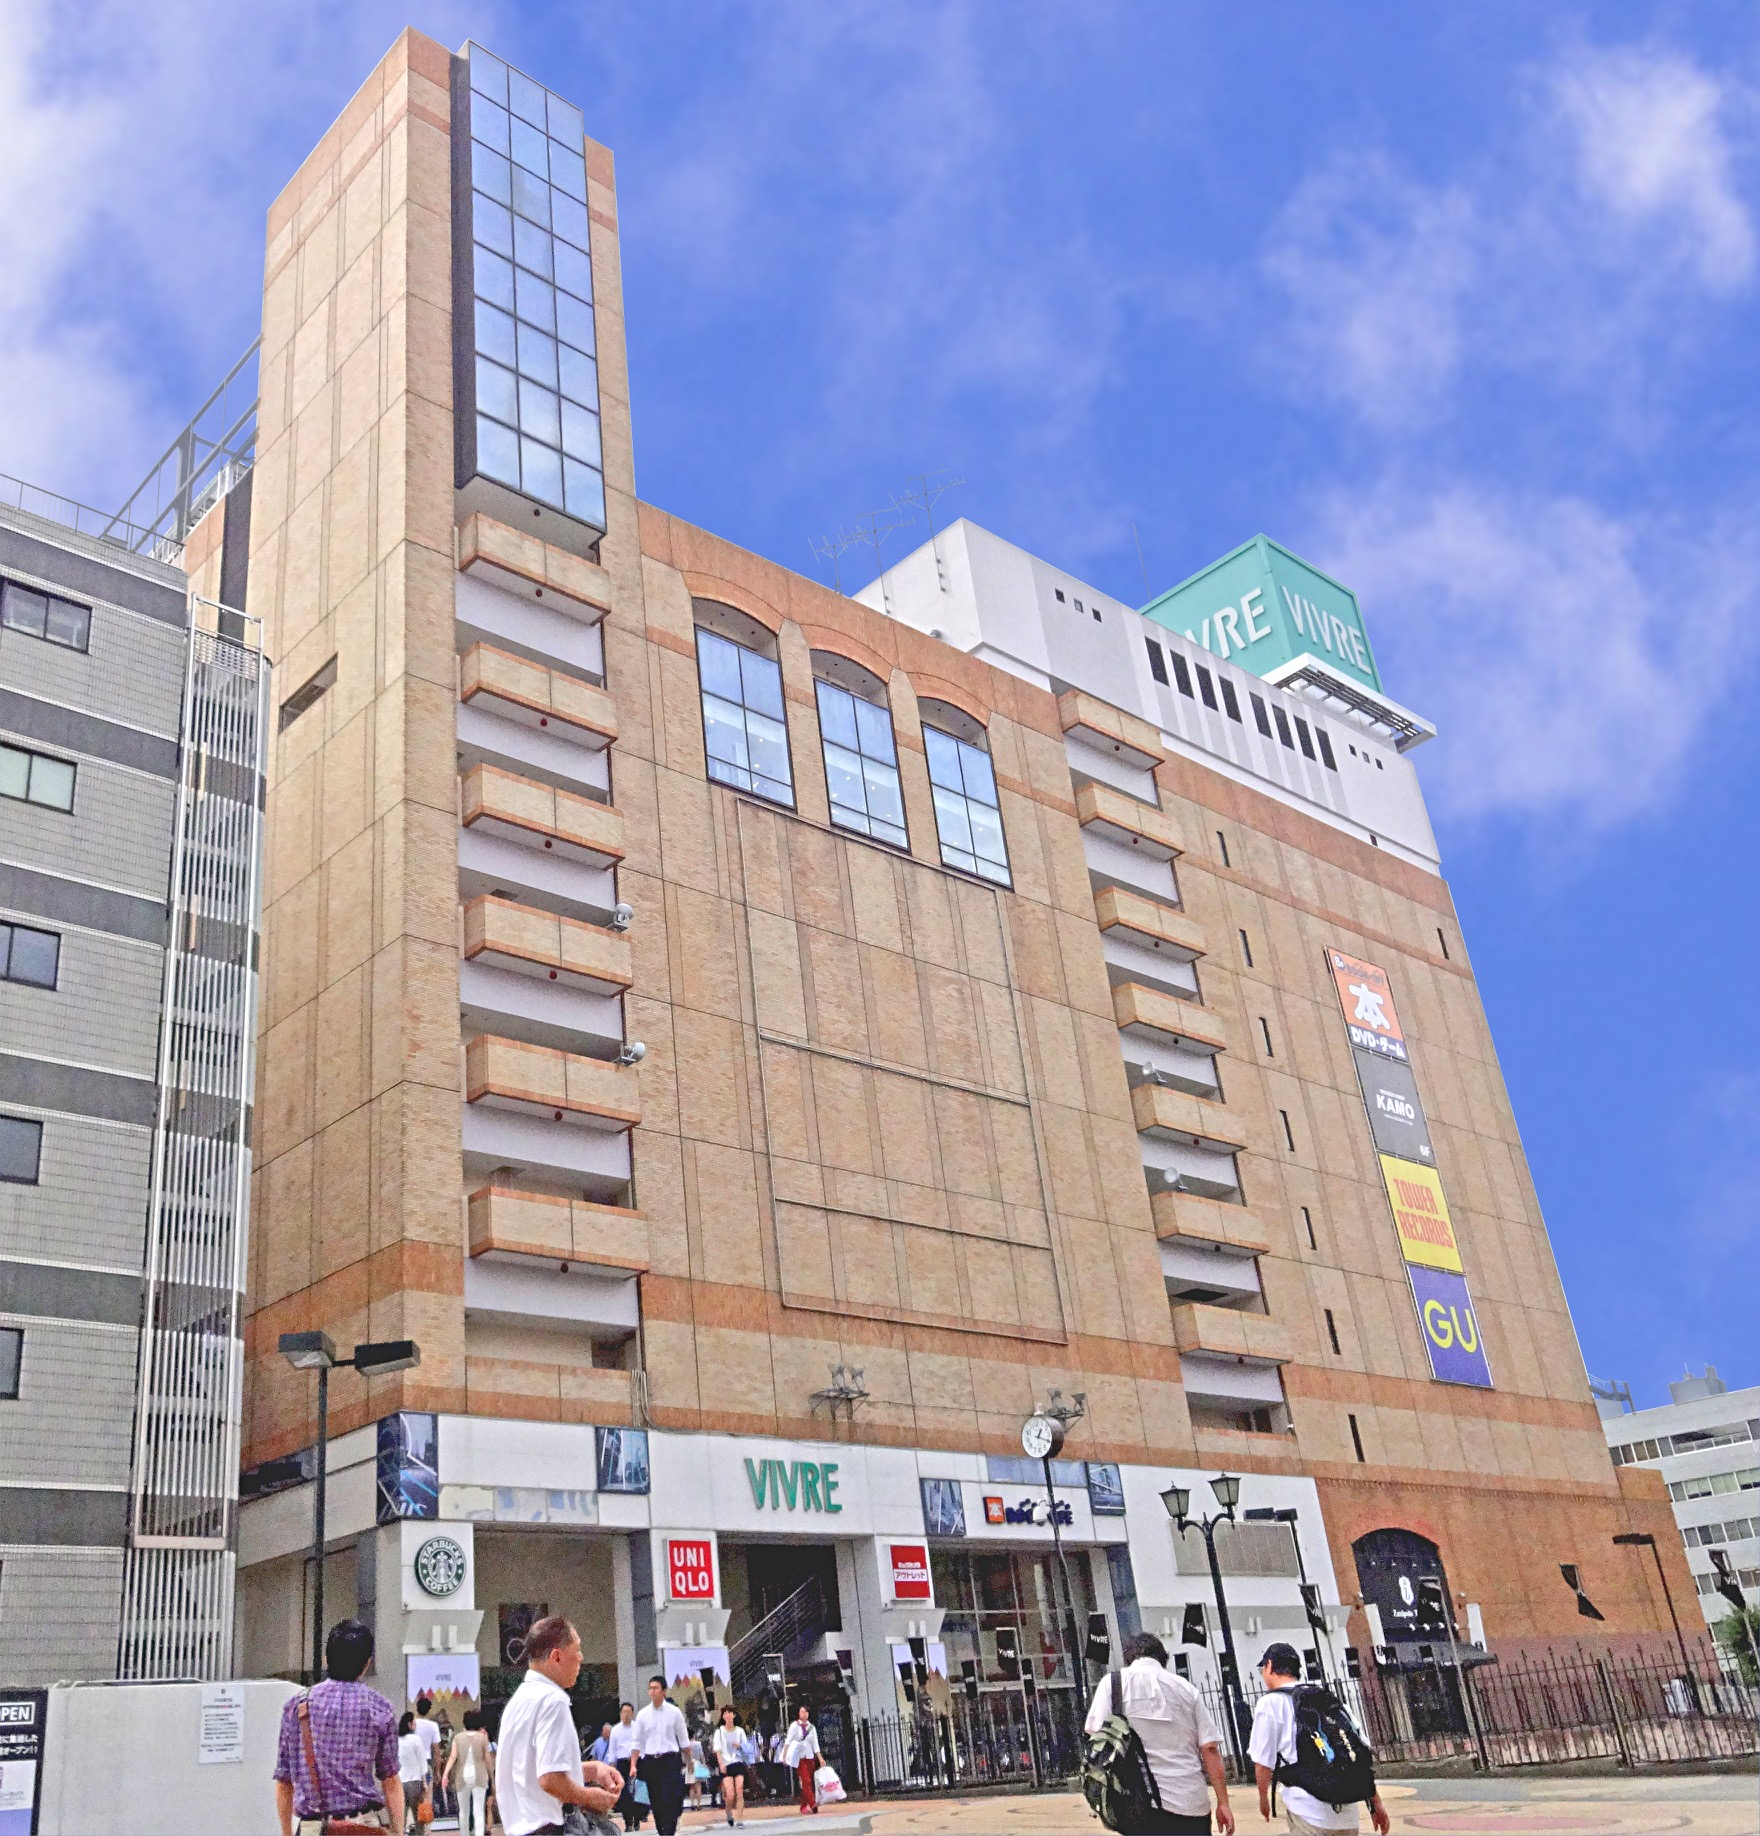 BICCAMERA Outlet Yokohama VIVRE Store